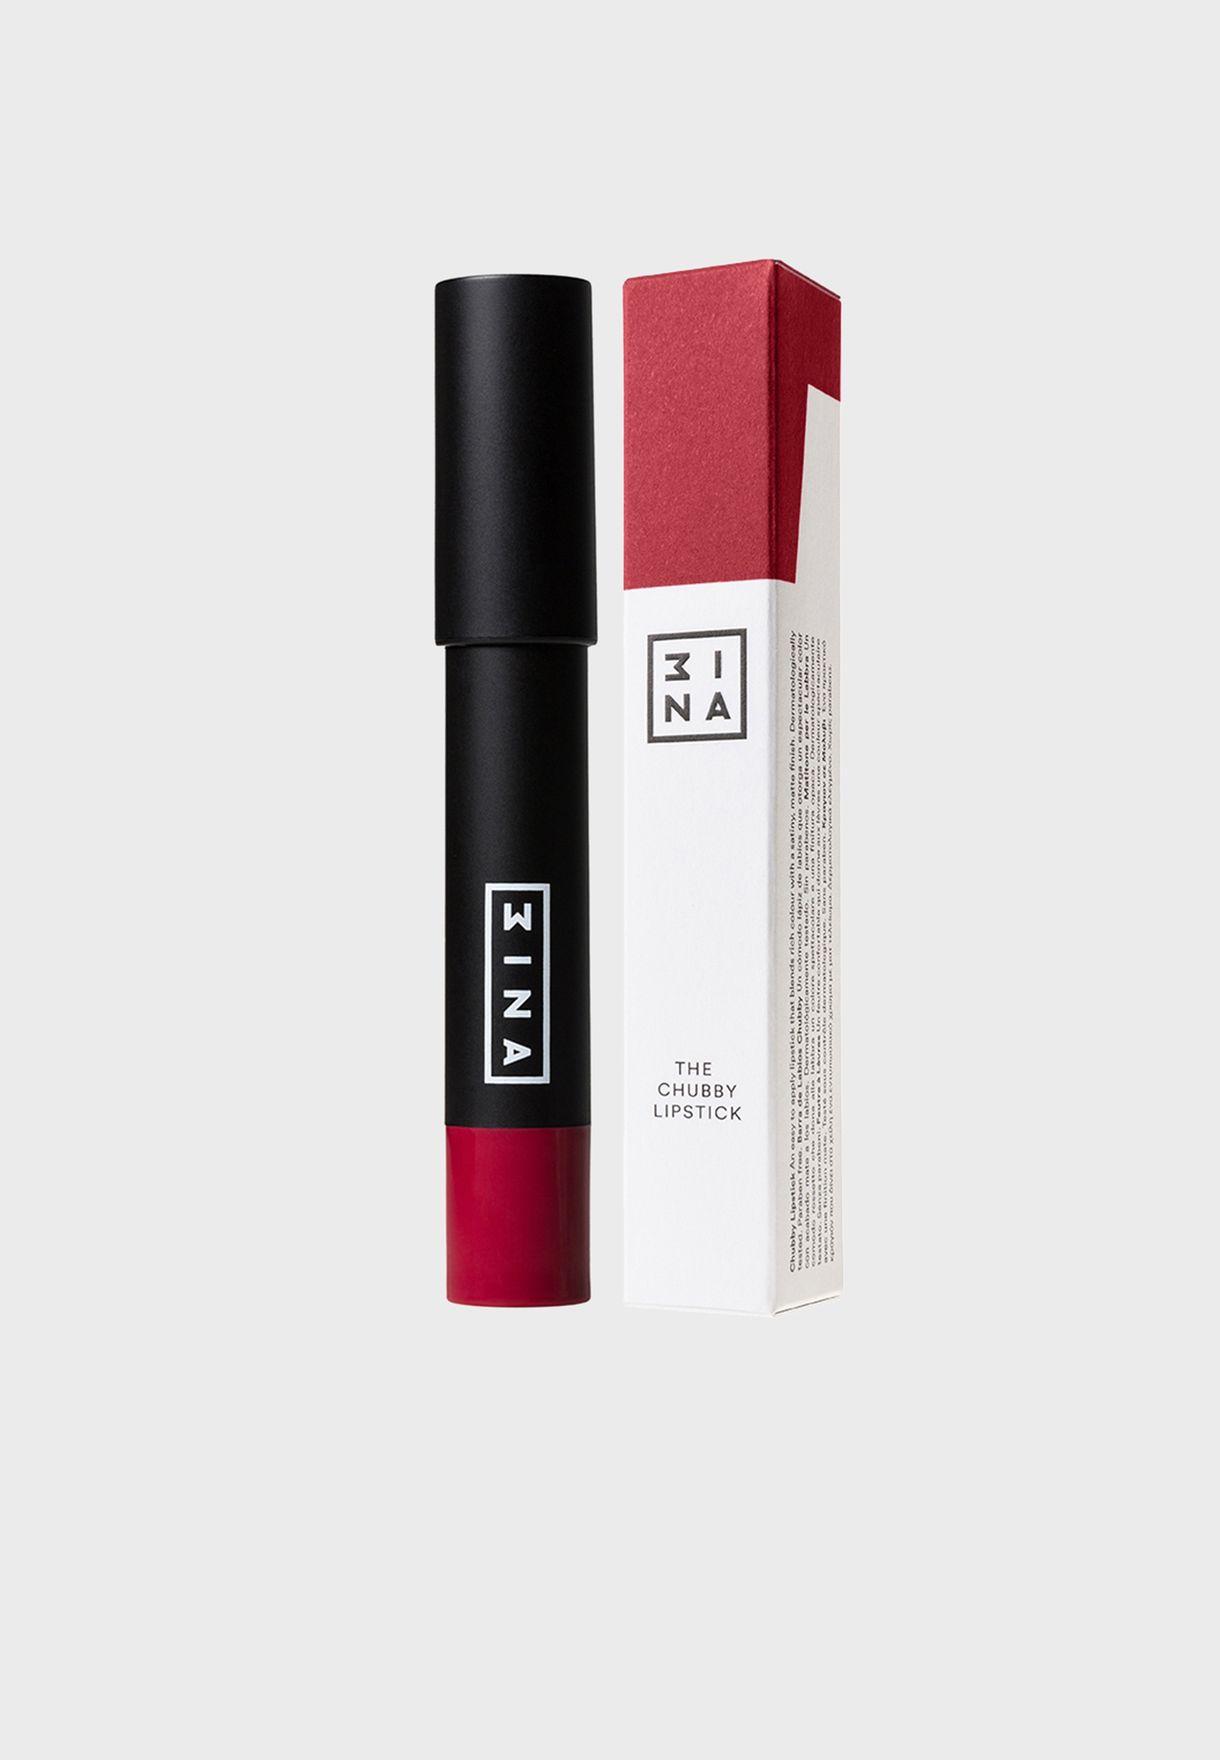 The Chubby Lipstick 102